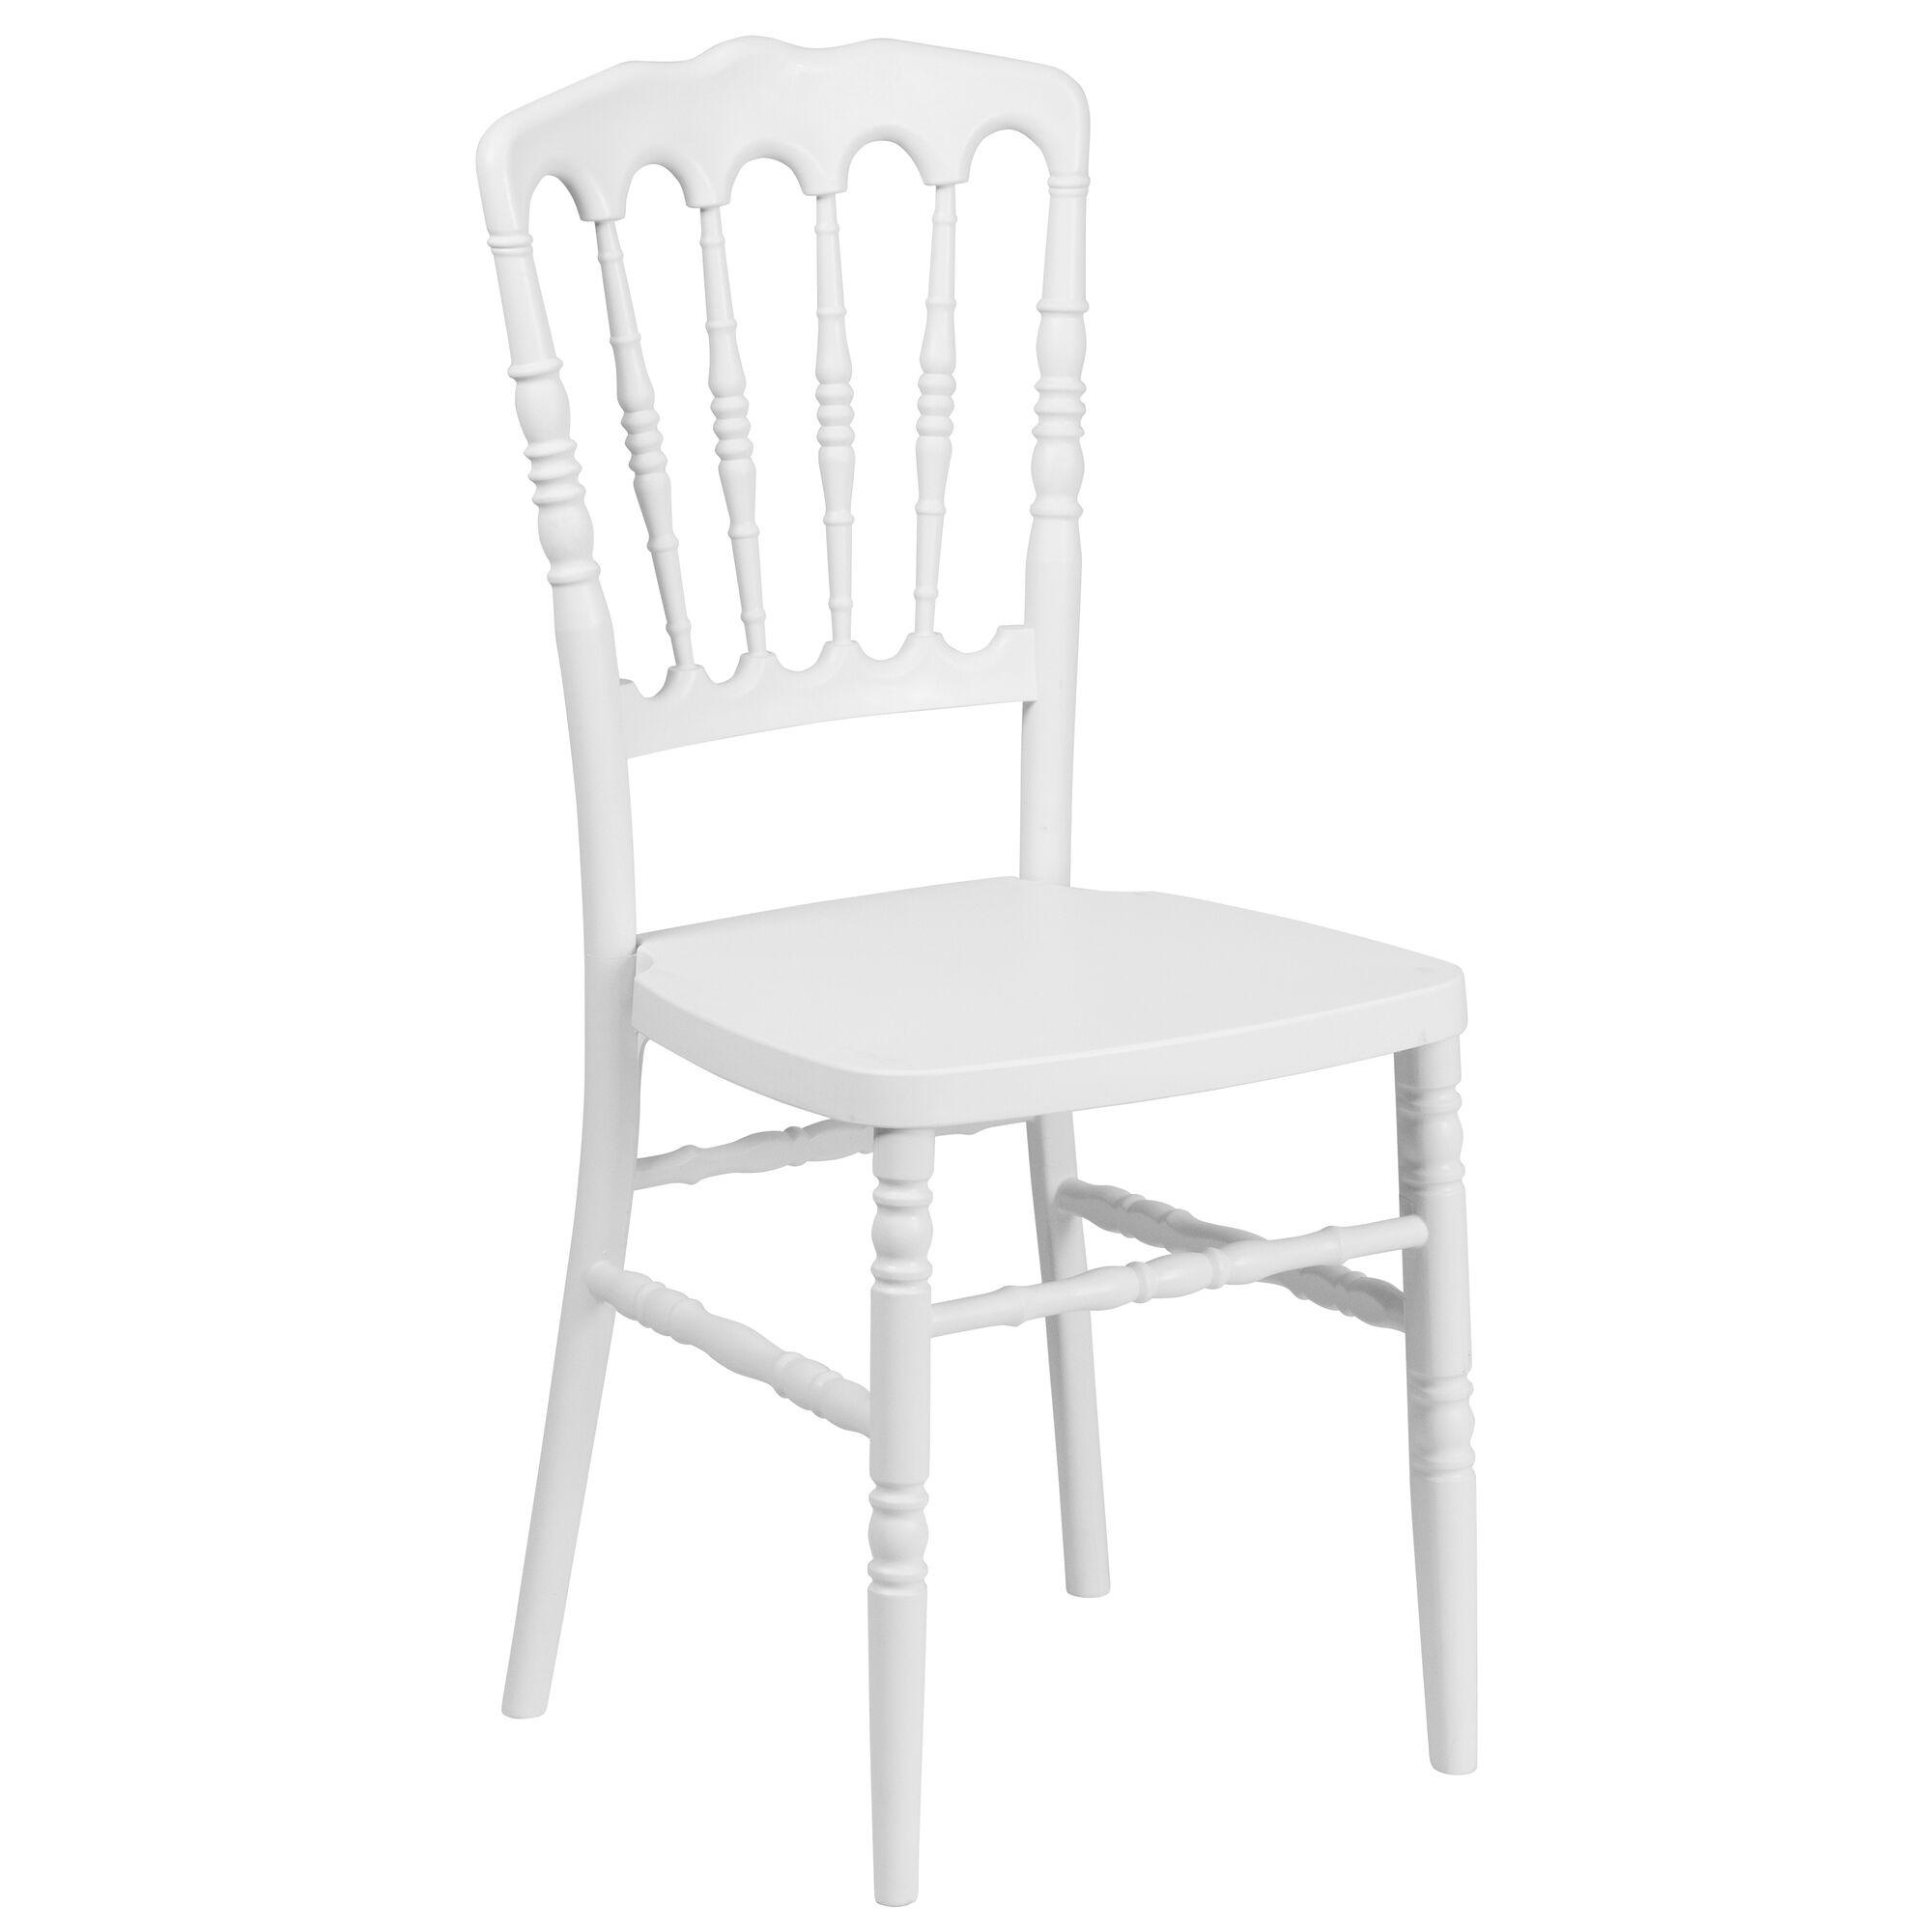 Awe Inspiring Hercules Series White Resin Stacking Napoleon Chair With Free Cushion Creativecarmelina Interior Chair Design Creativecarmelinacom